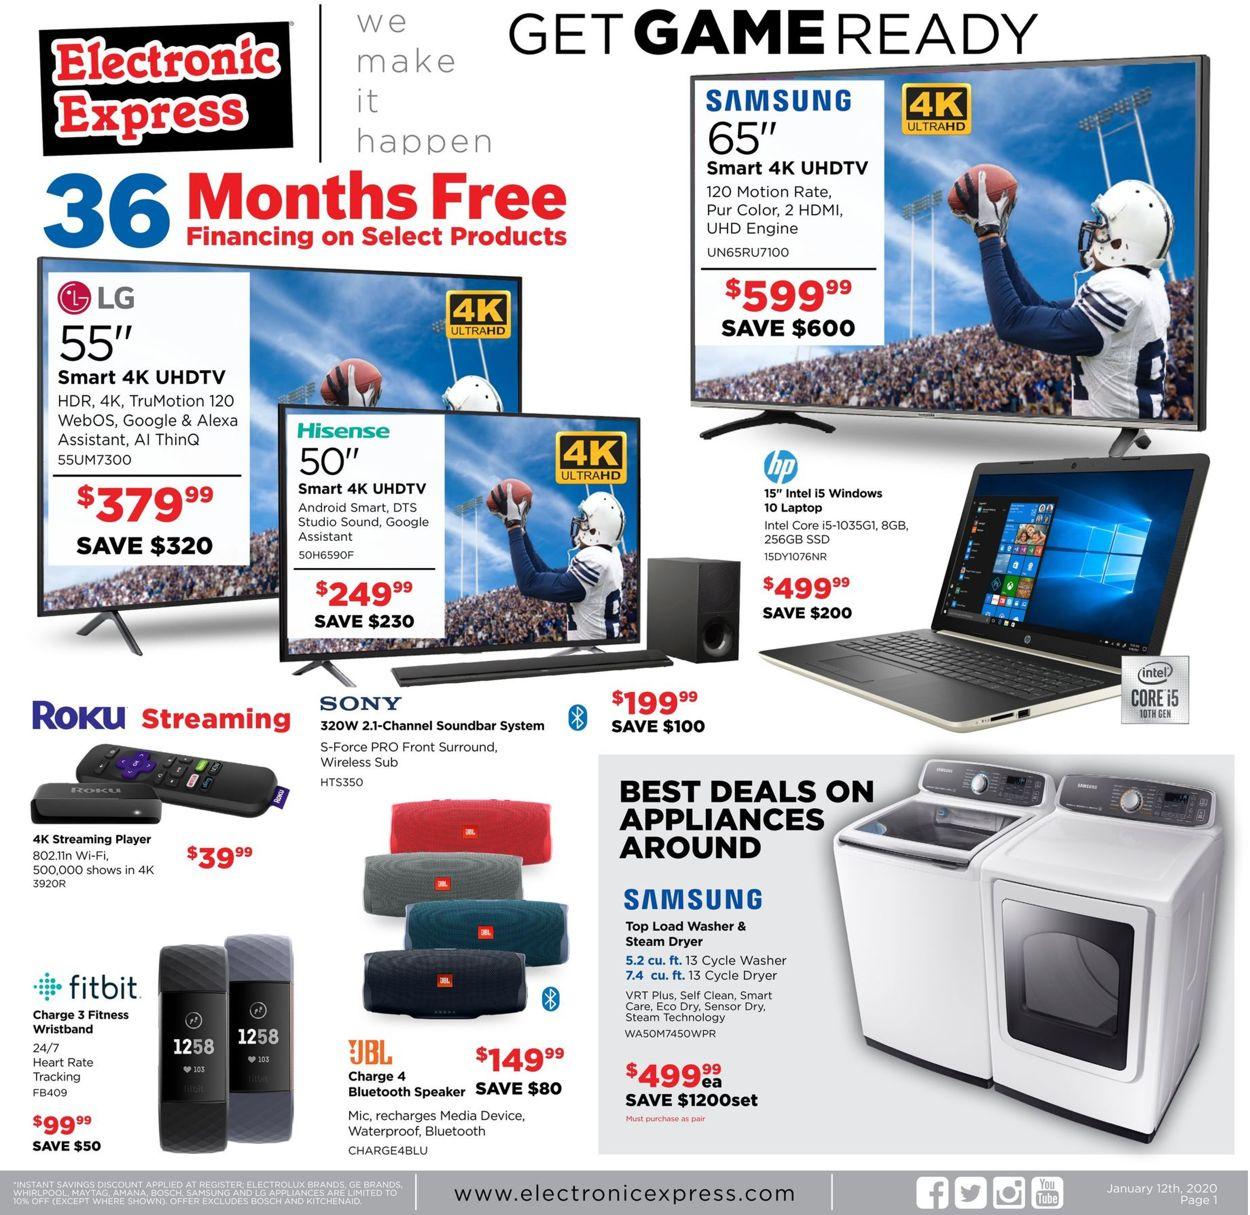 Electronic Express Weekly Ad Circular - valid 01/12-01/18/2020